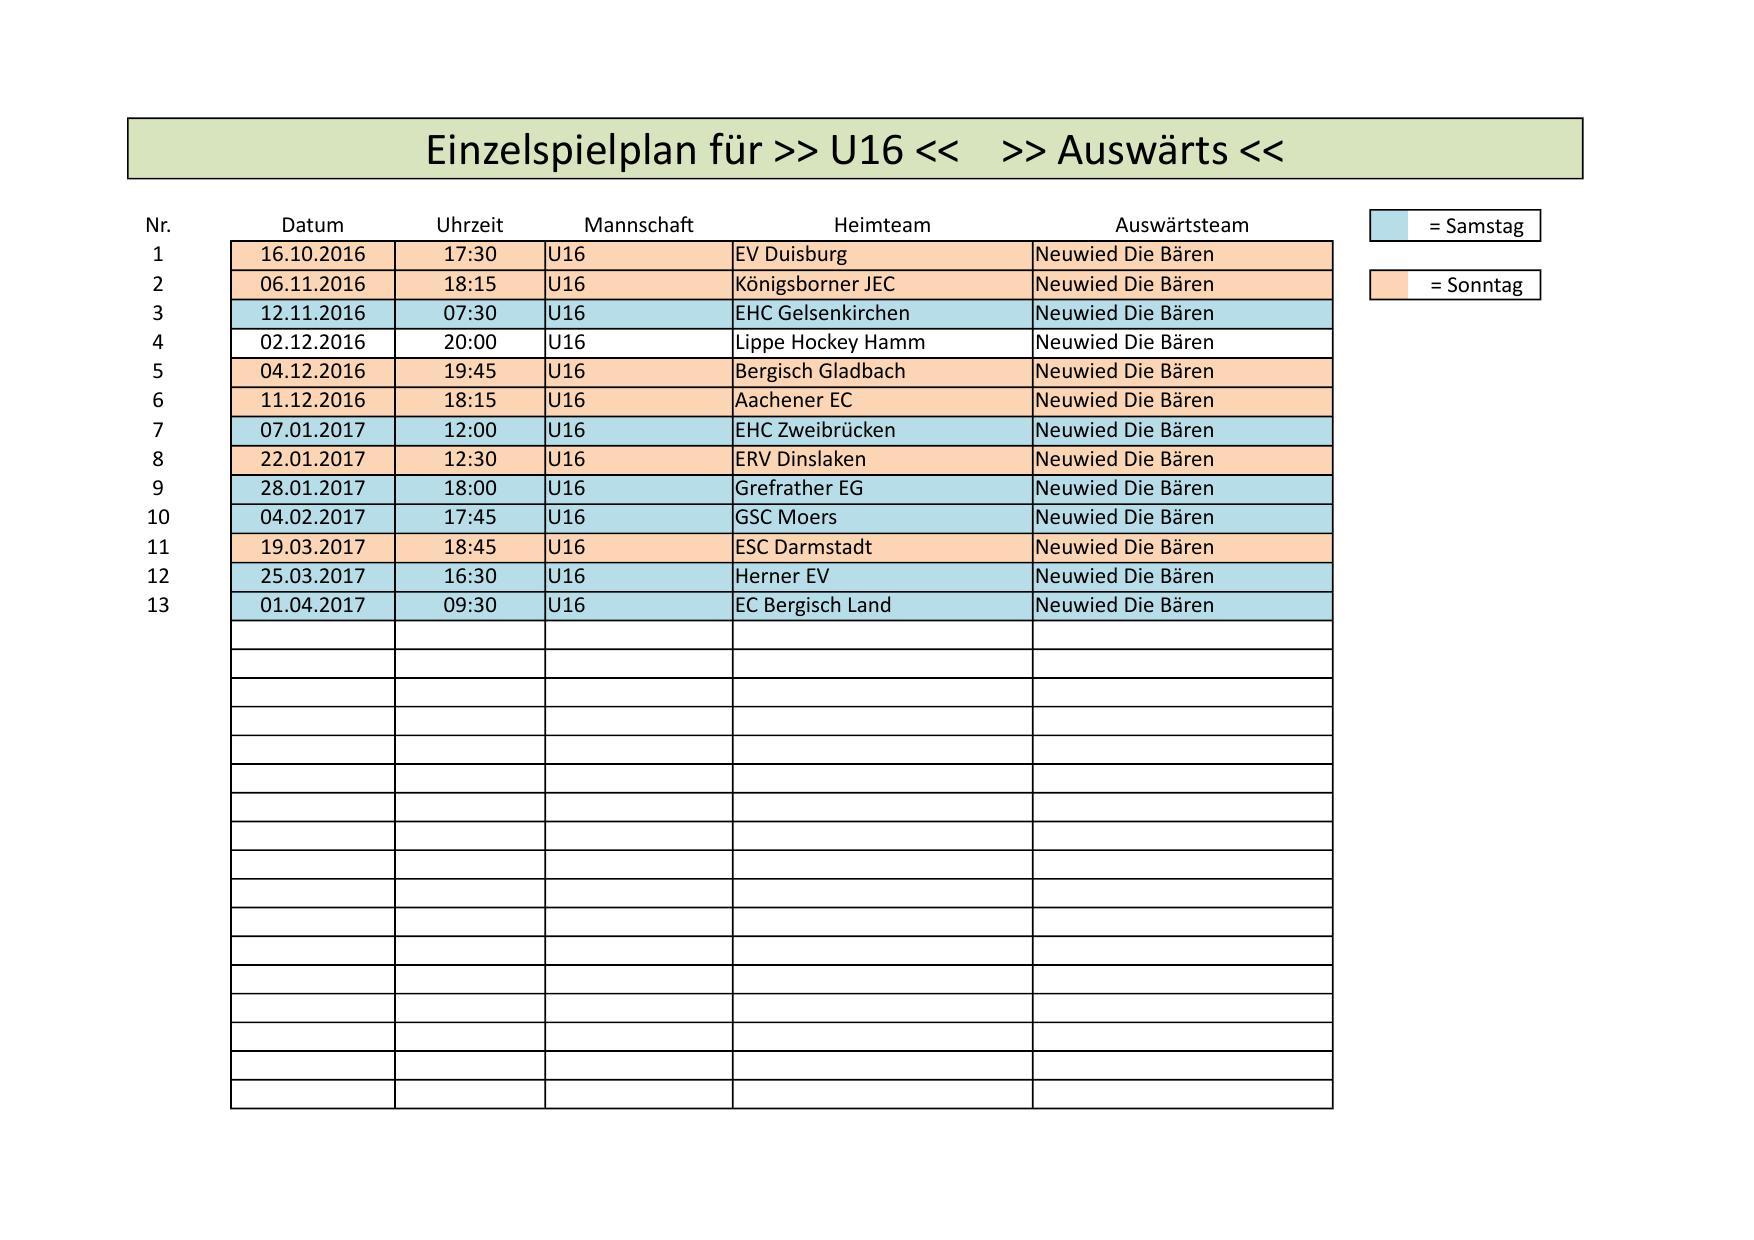 u16_auswaerts-pdf_000002